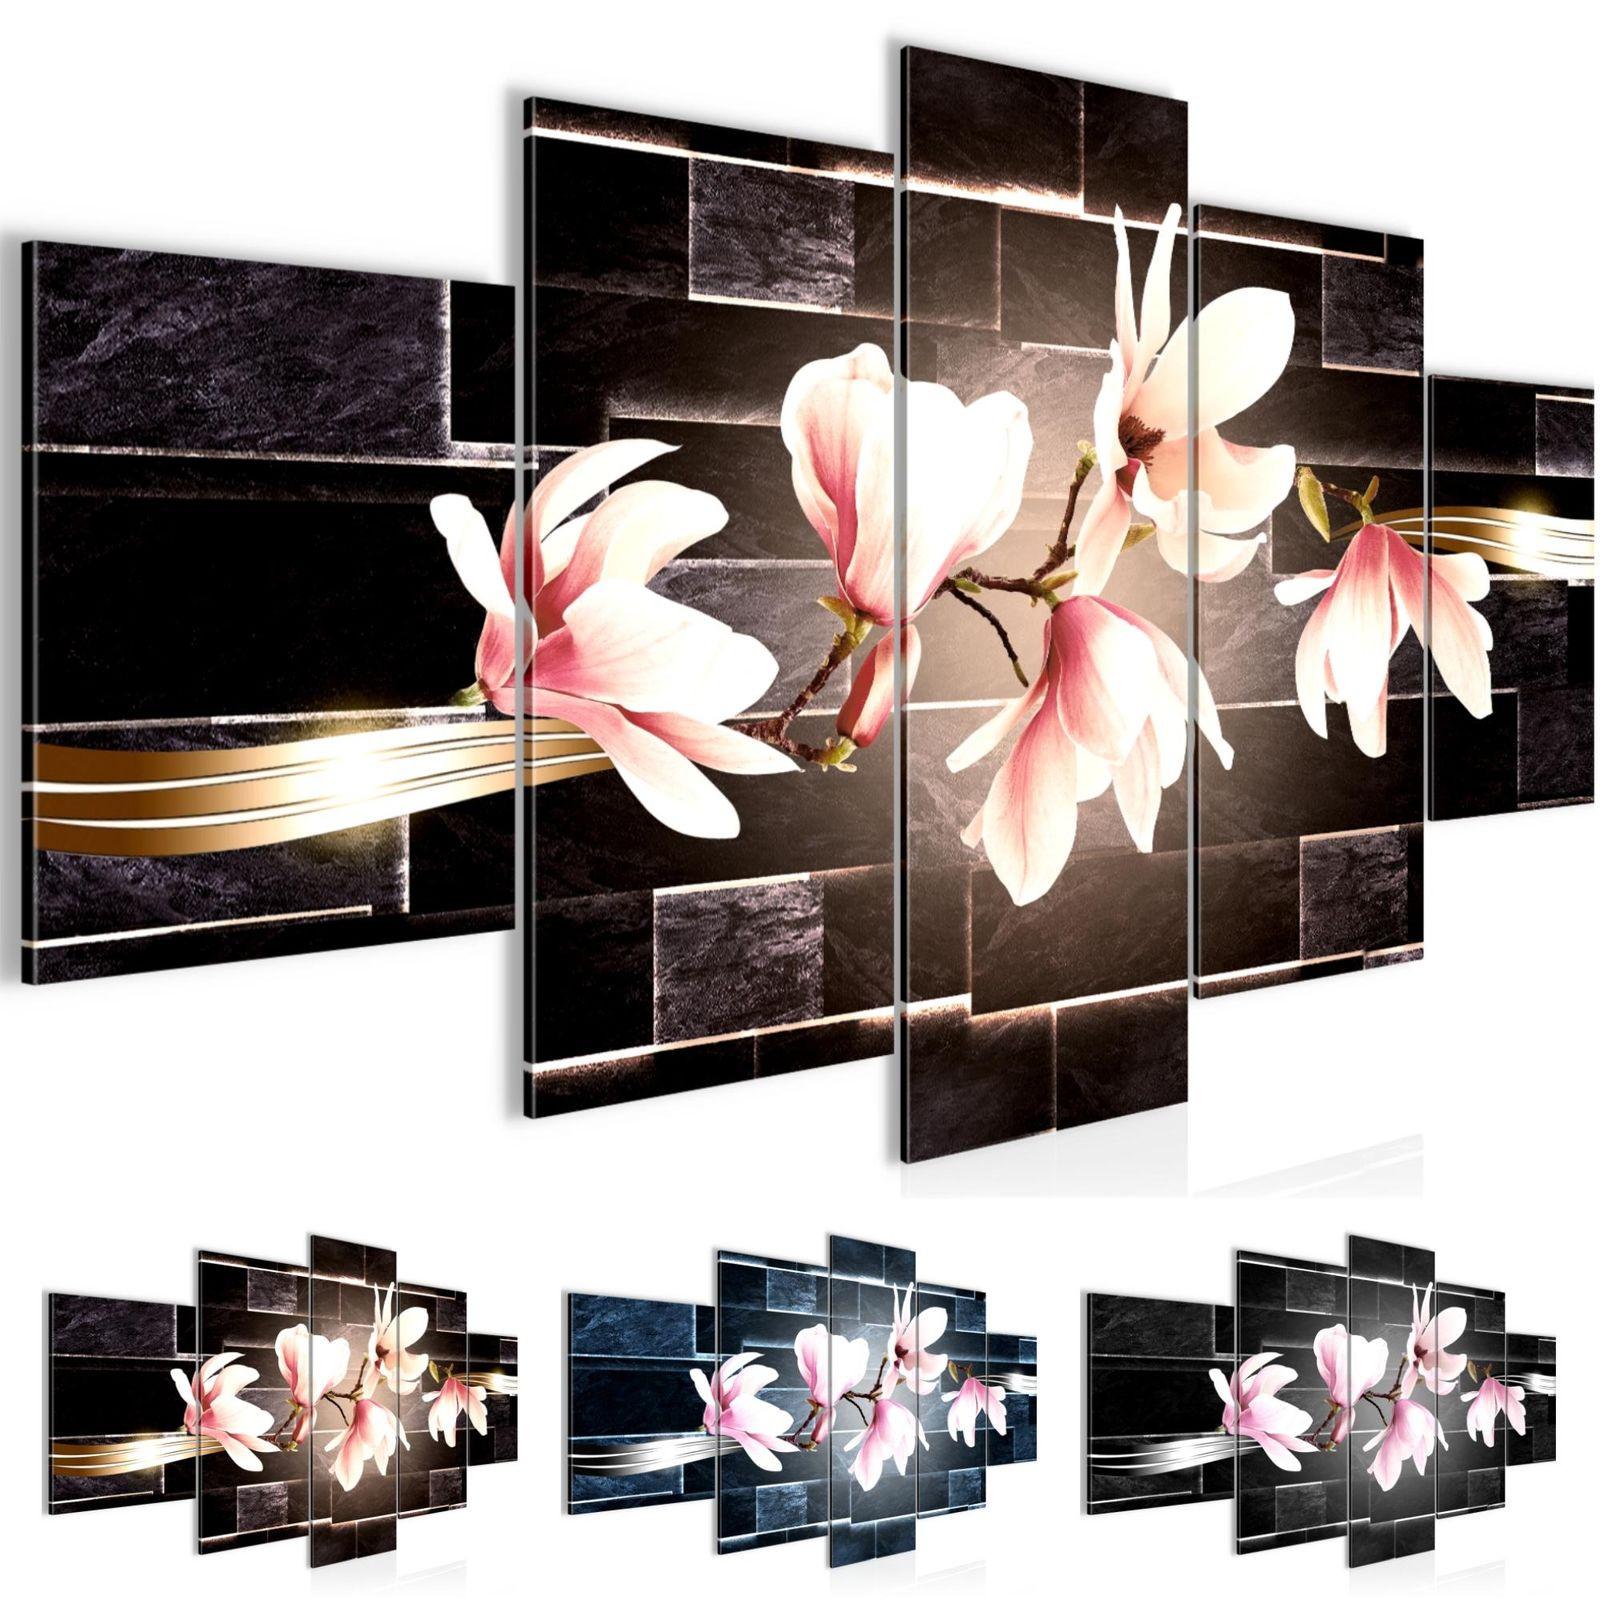 Wandbilder Blumen Magnolien Vlies Leinwand Bild Xxl Bilder Kunstdruck p